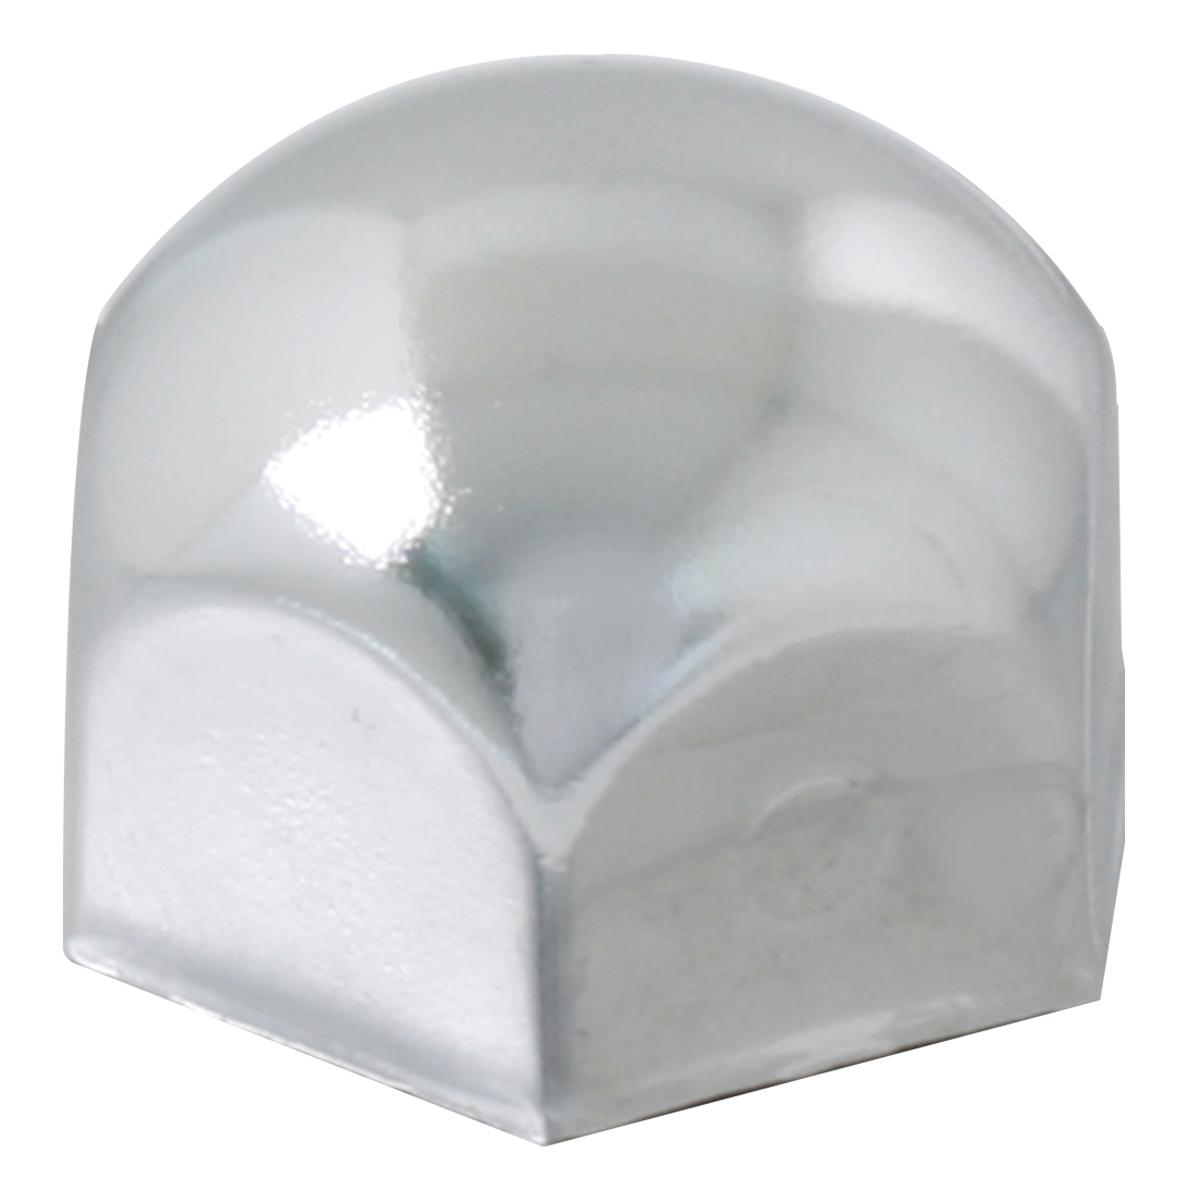 70020 Chrome Push-On Standard Lug Nut Cover w/o Flange for Bumper